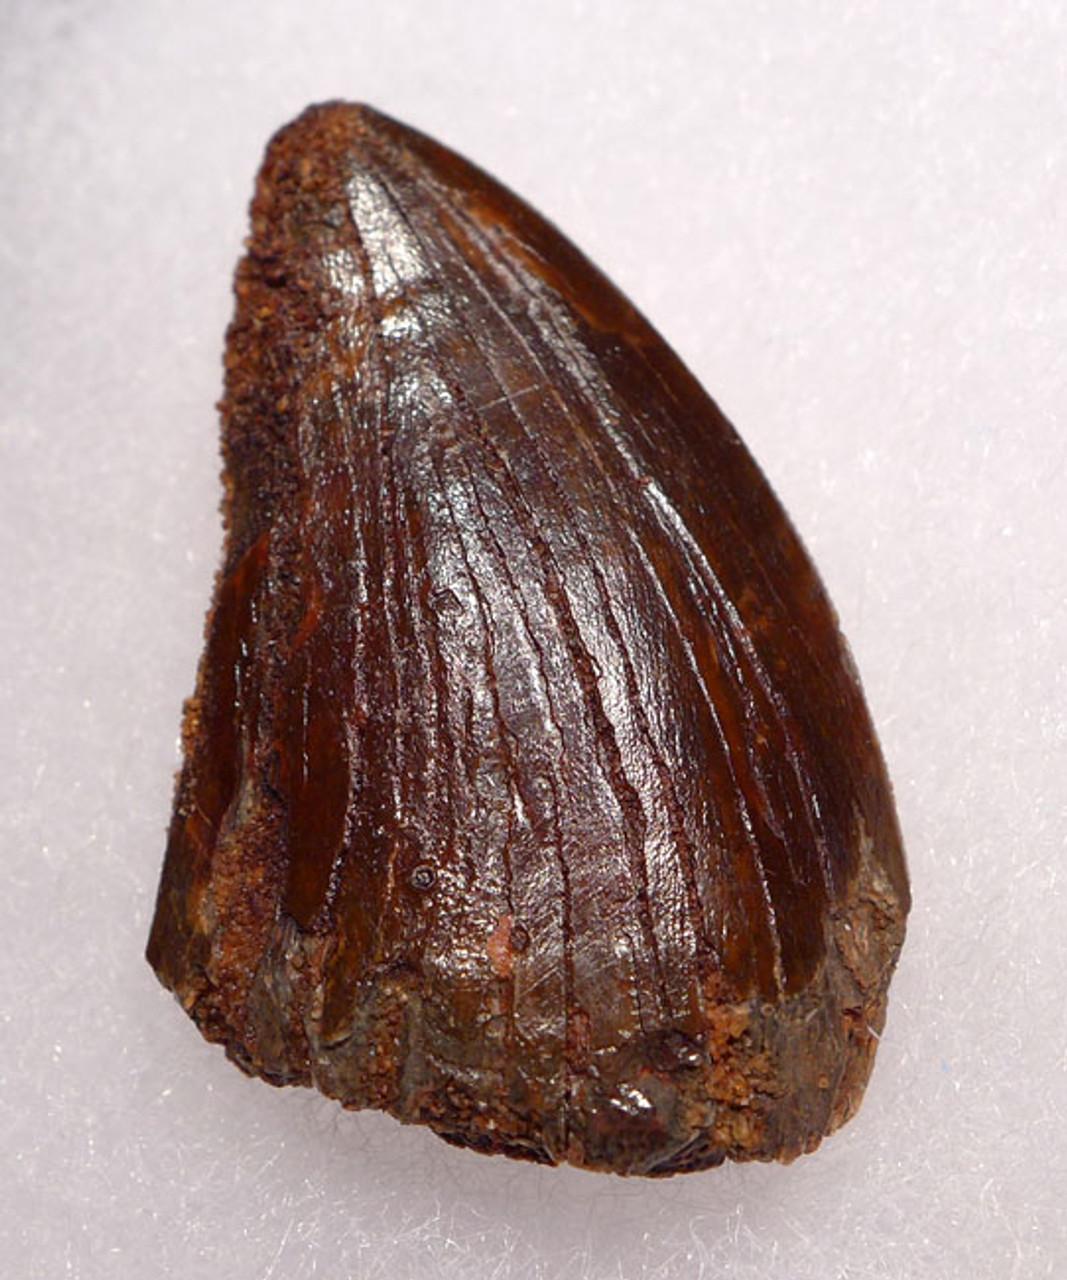 DT2-072 - UNBROKEN 1.75 INCH UNBROKEN CARCHARODONTOSAURUS FOSSIL DINOSAUR TOOTH